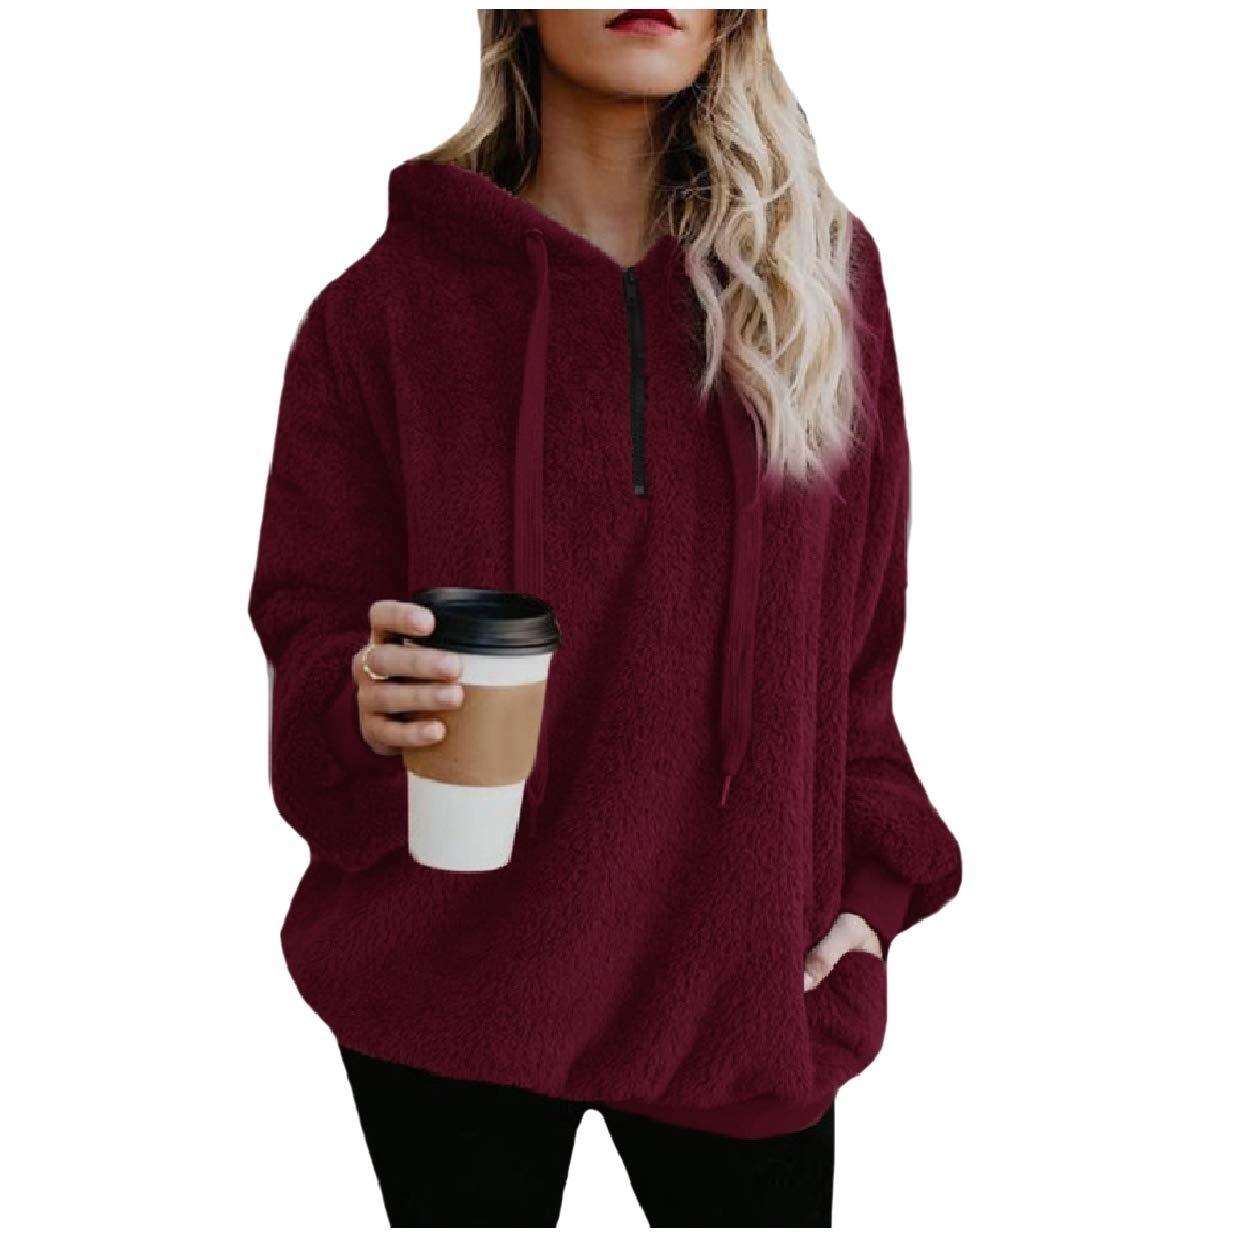 RDHOPE-Women Pure Colour Fleece Pocket Pullover Warm Hoodies Sweater